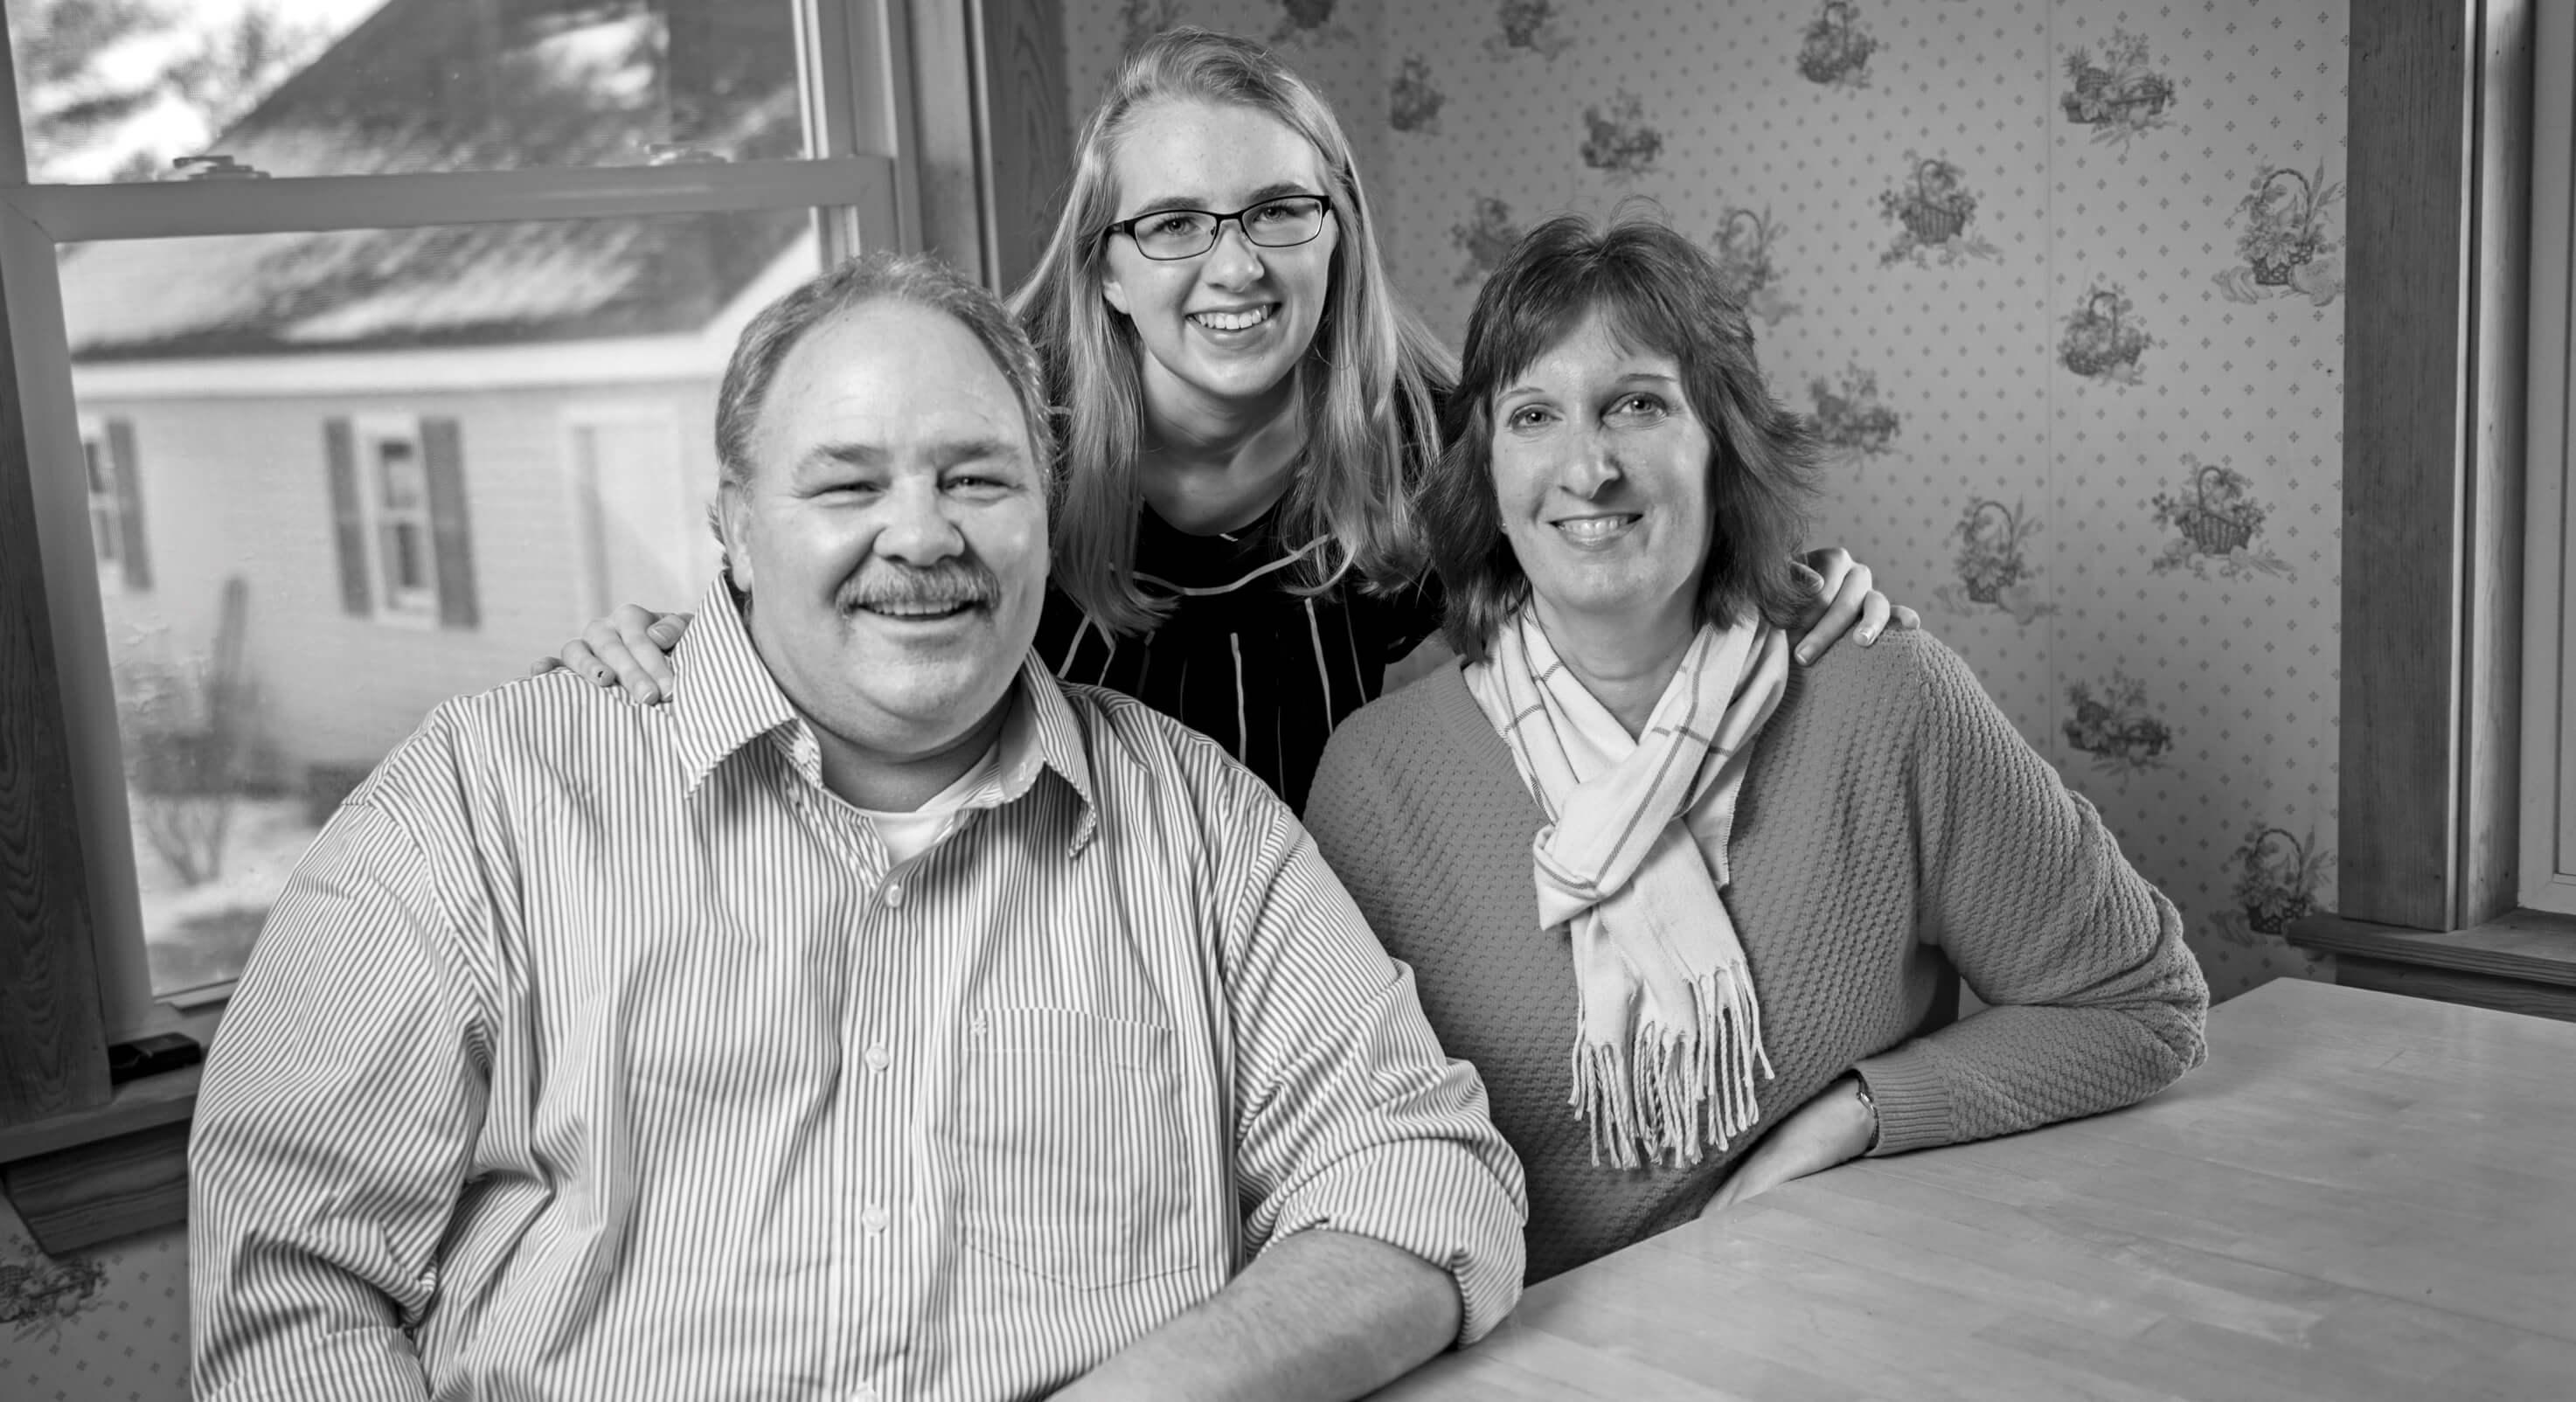 Hayden-family-centered-image